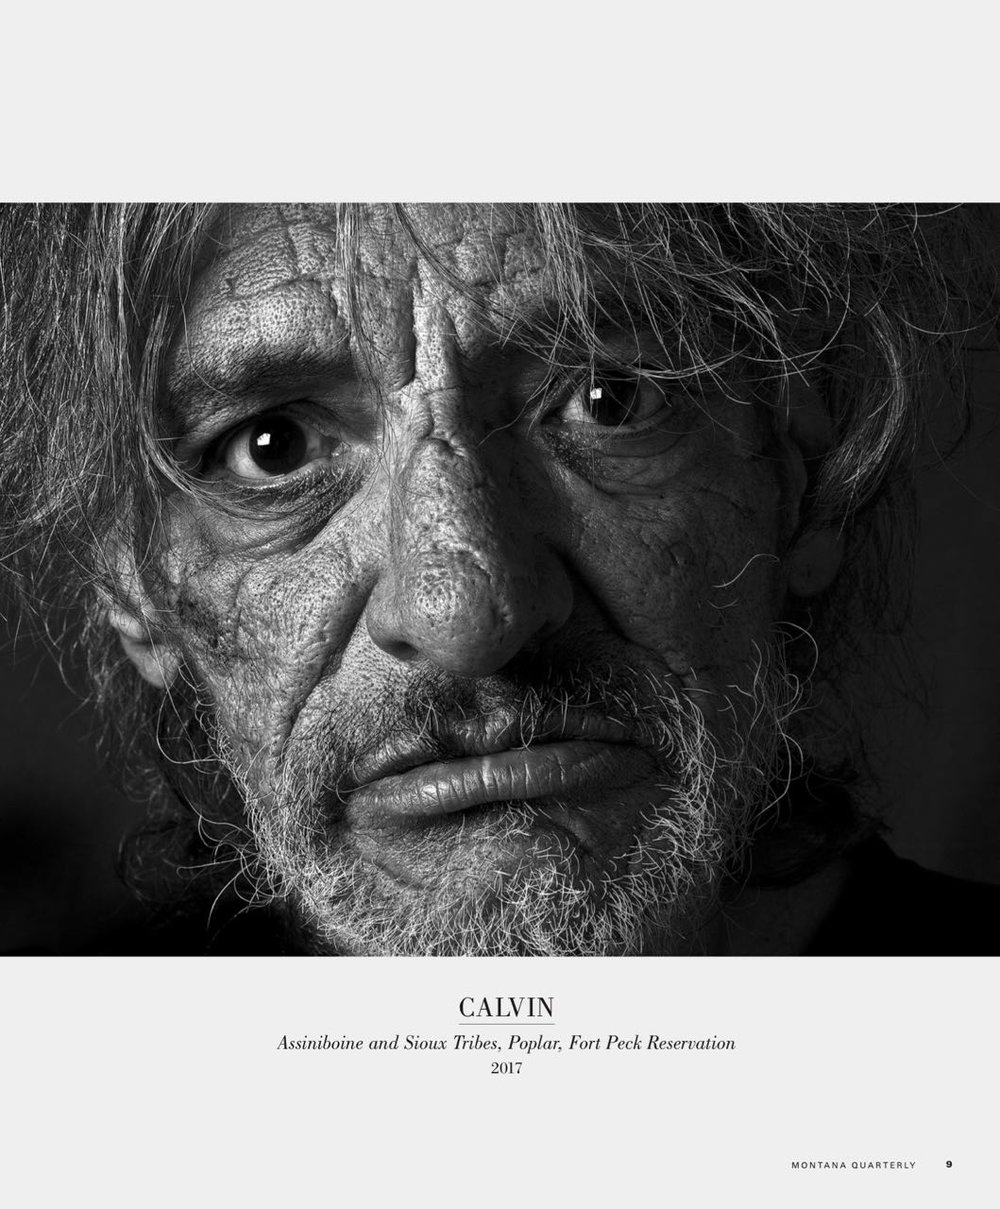 calvin_MQ.jpg